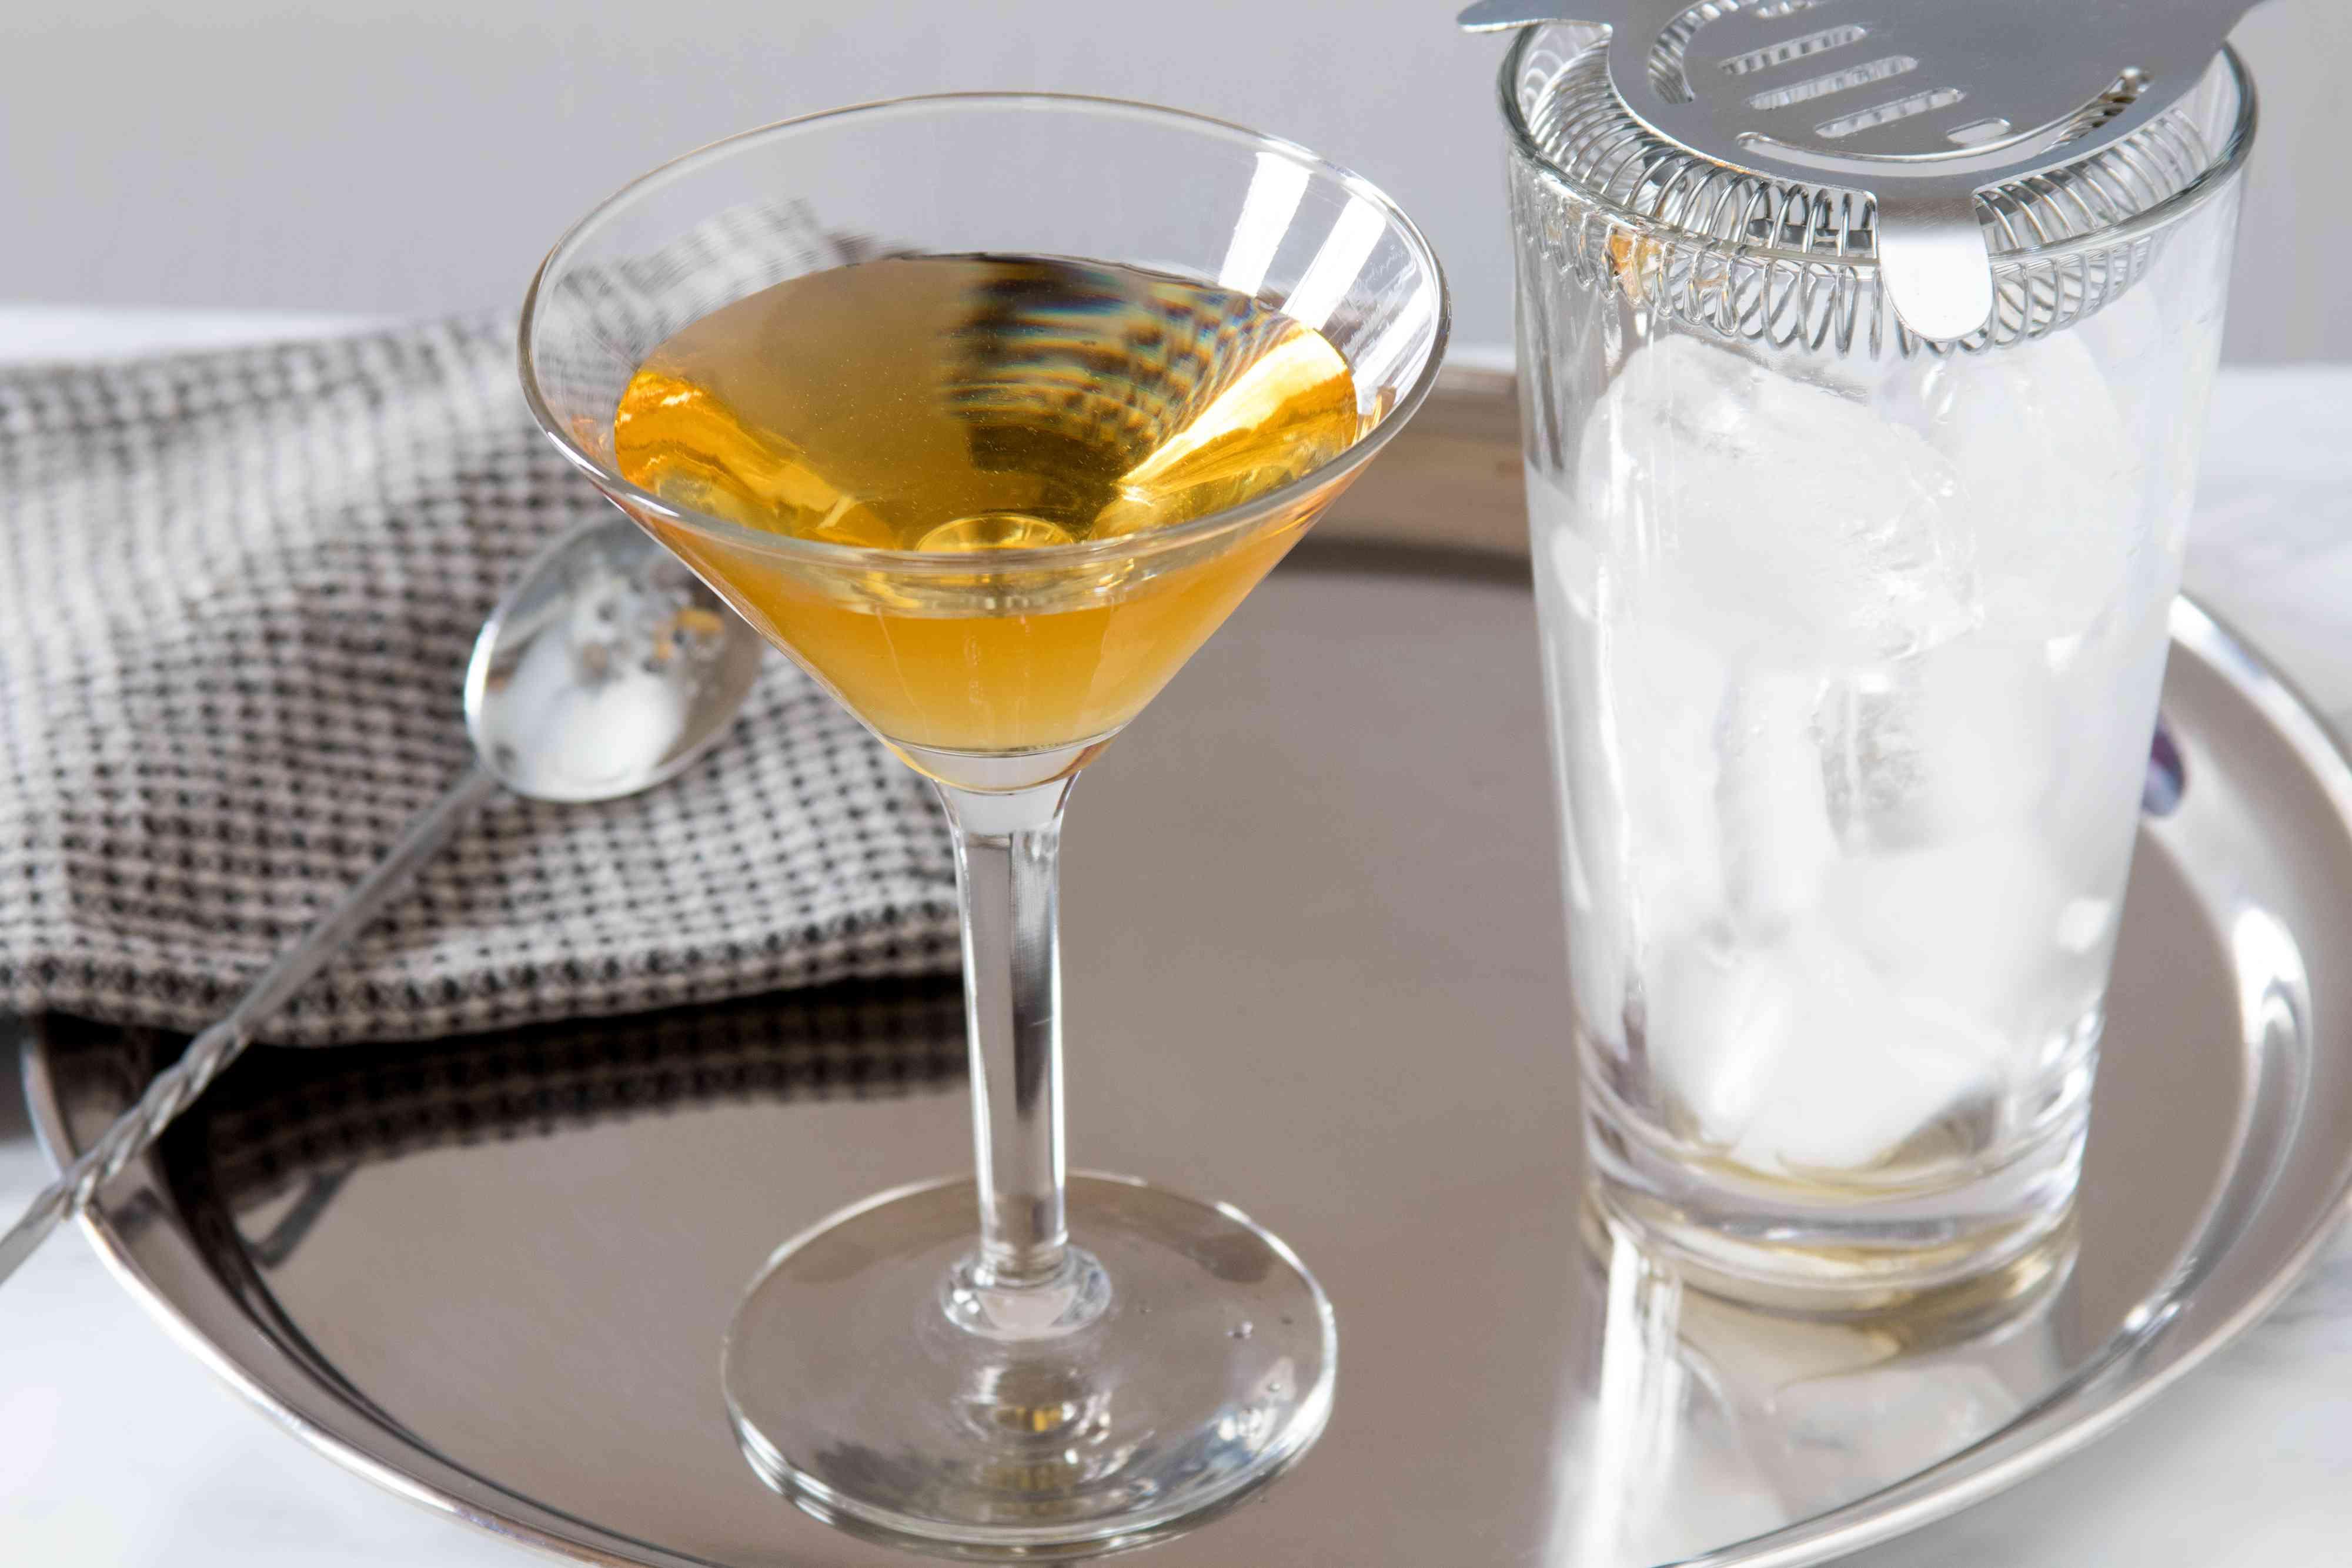 Straining a Perfect Martini